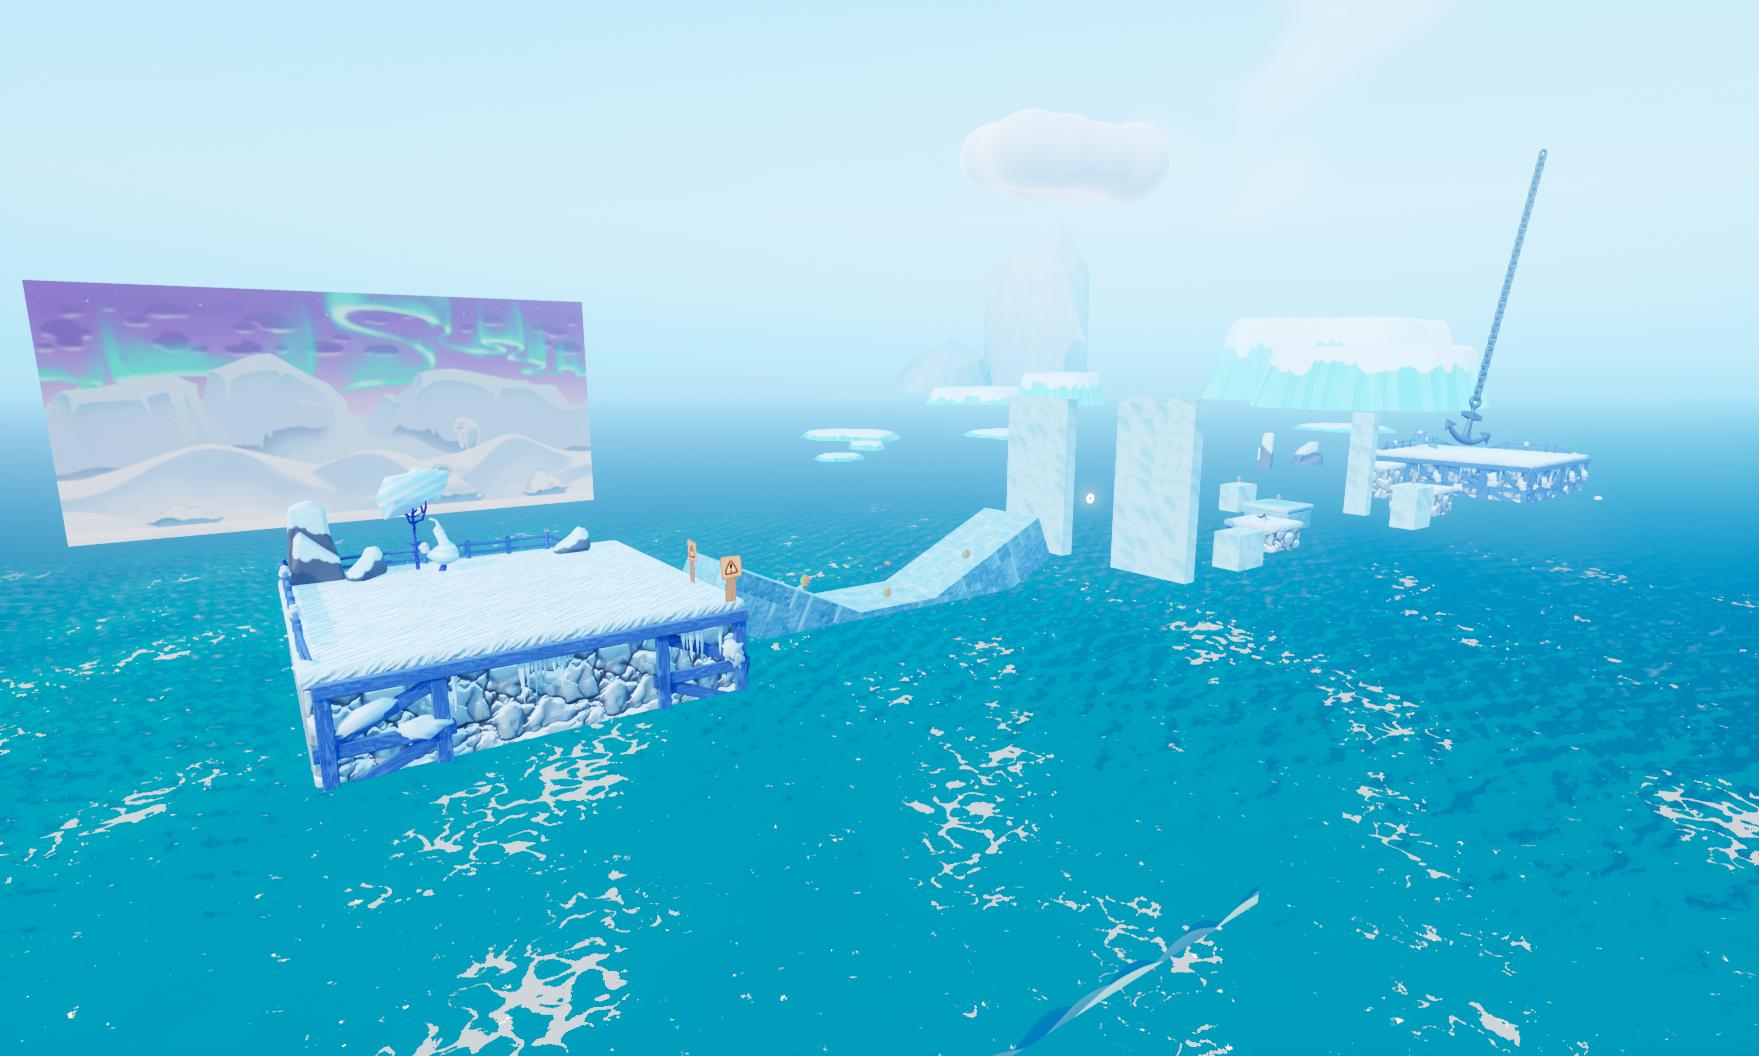 IceLevel01